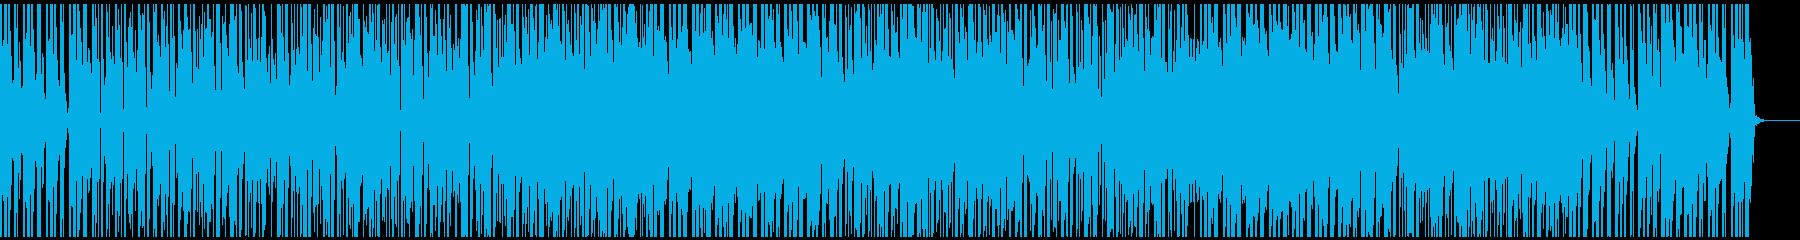 Hハンターズを想起させるファンキーな曲の再生済みの波形